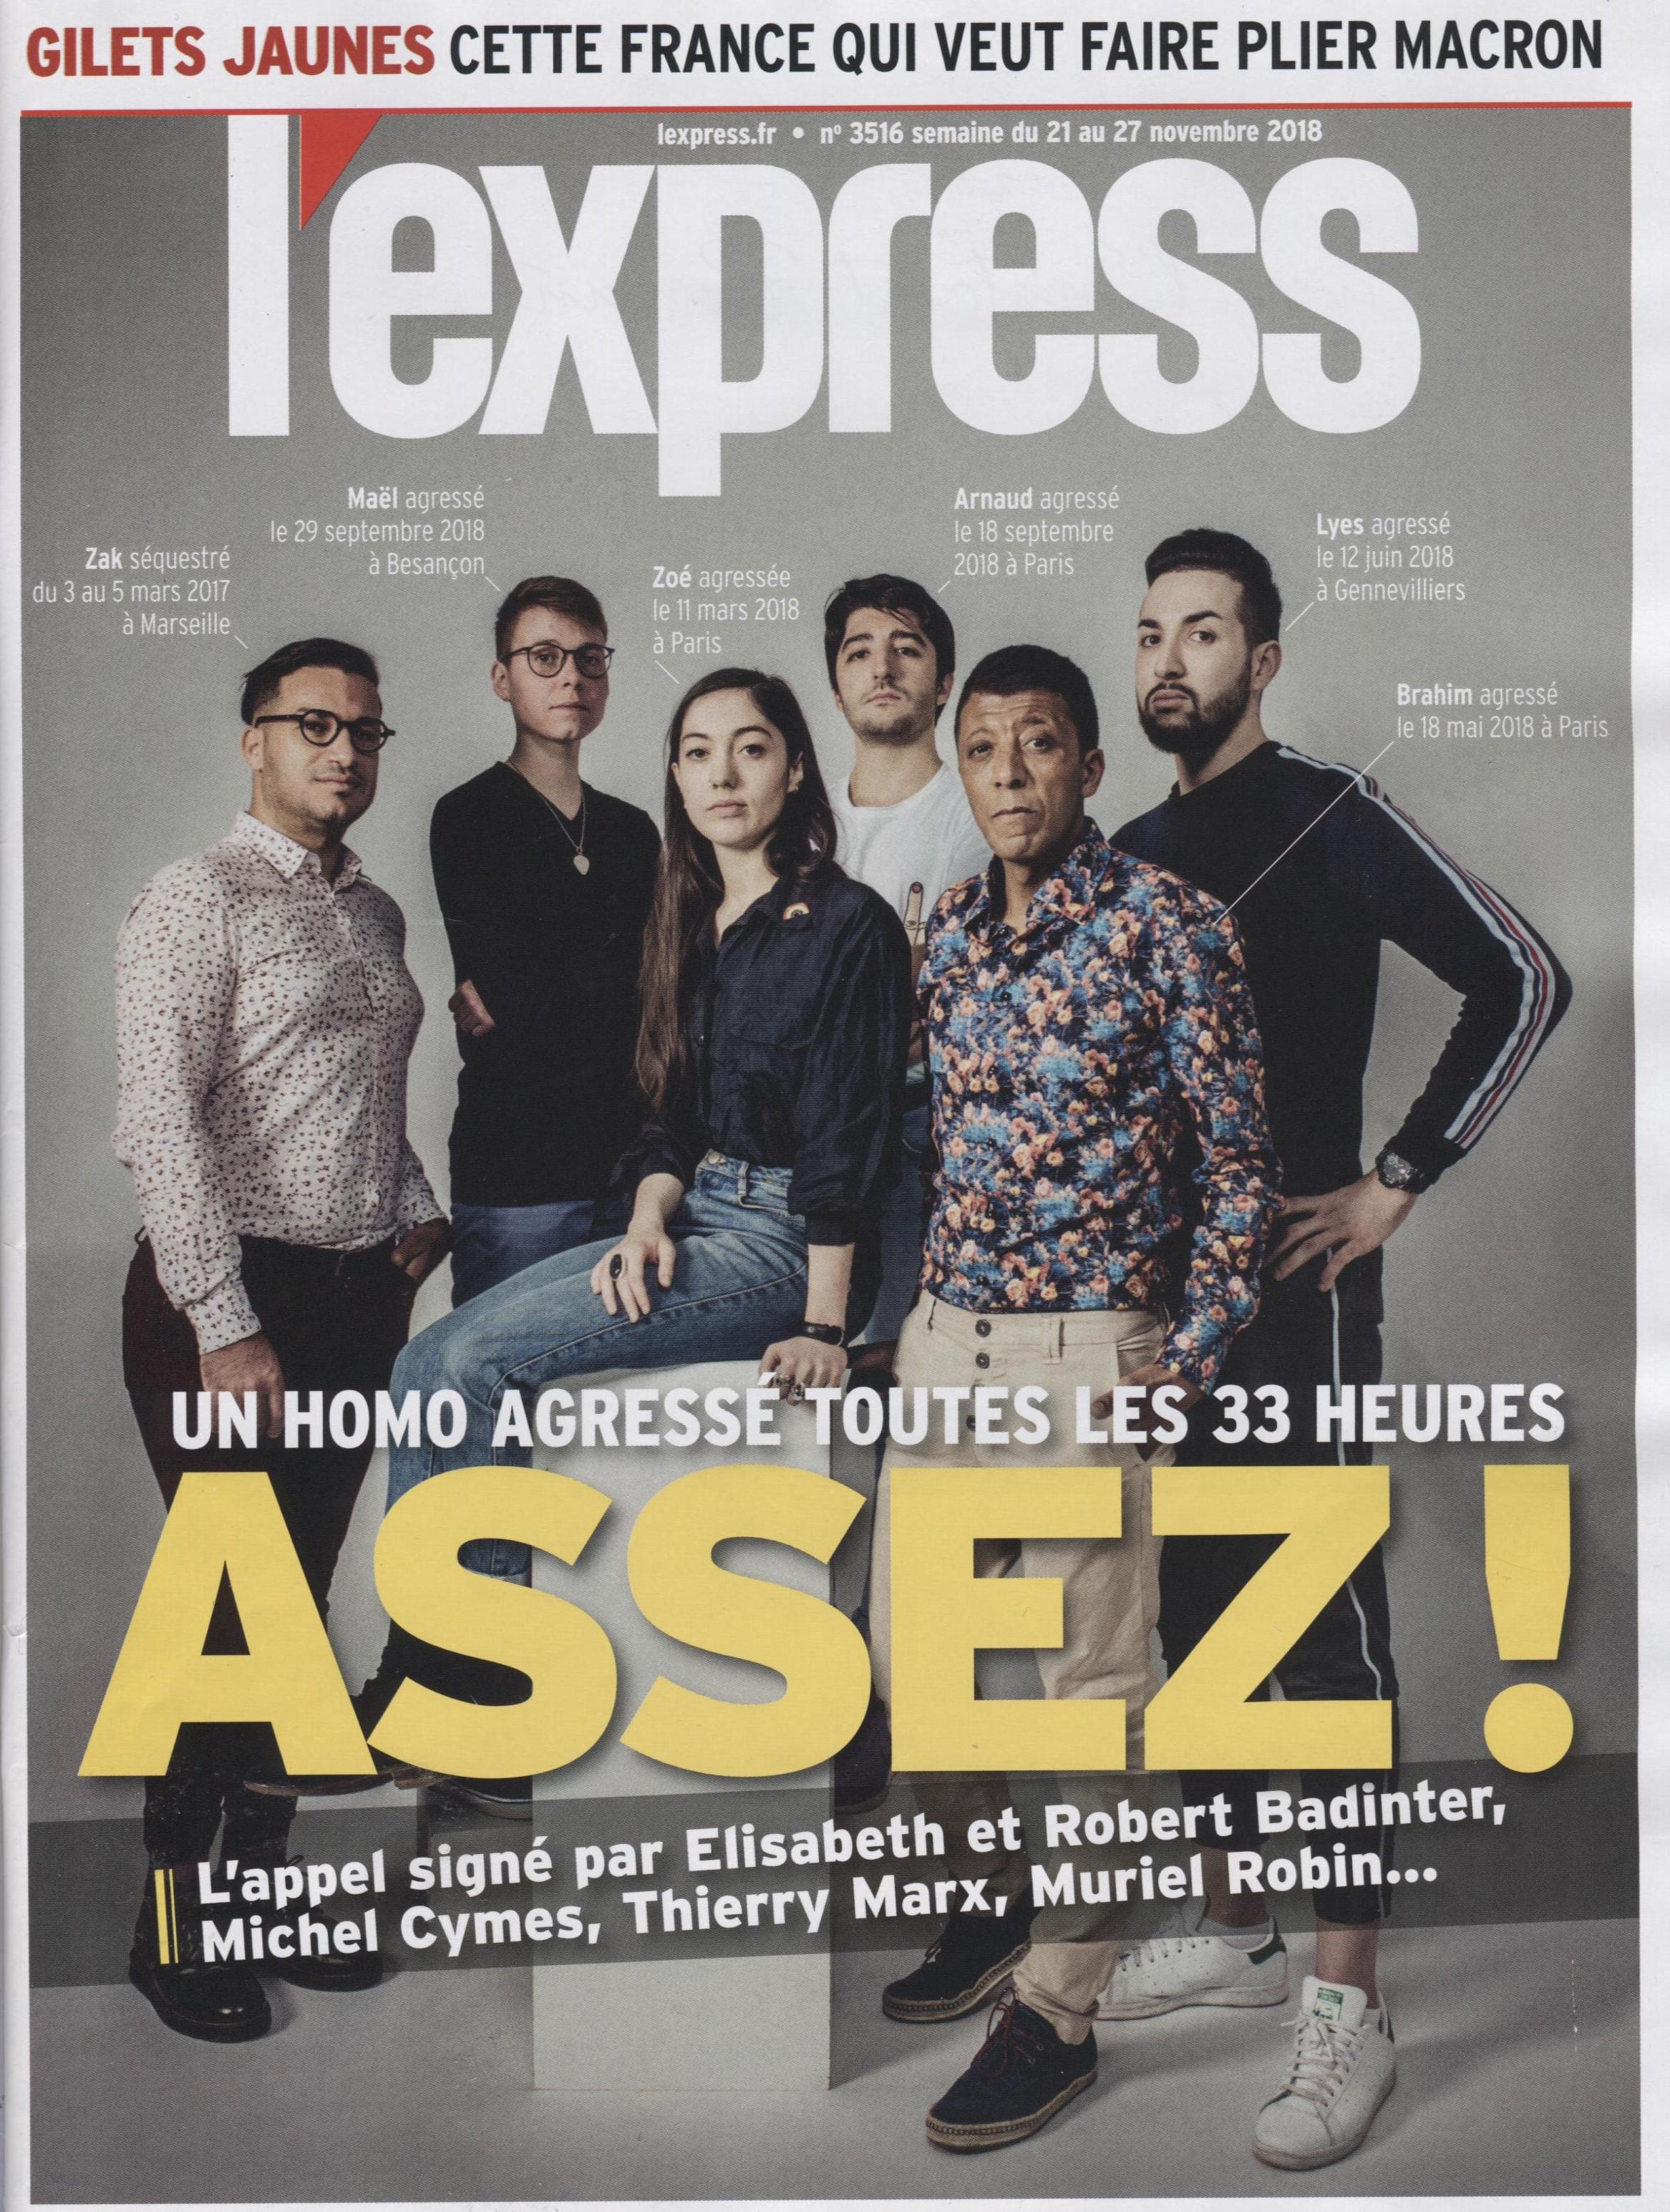 L'EXPRESS 22 NOVEMBRE 2018 COUV